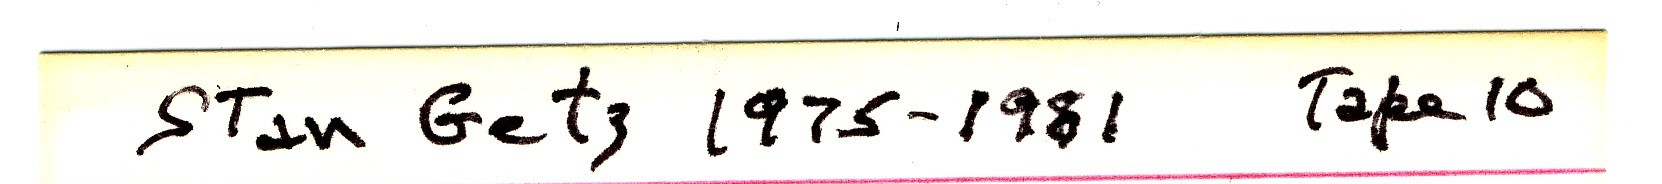 Stan_Getz_Tape_10_1975-1981